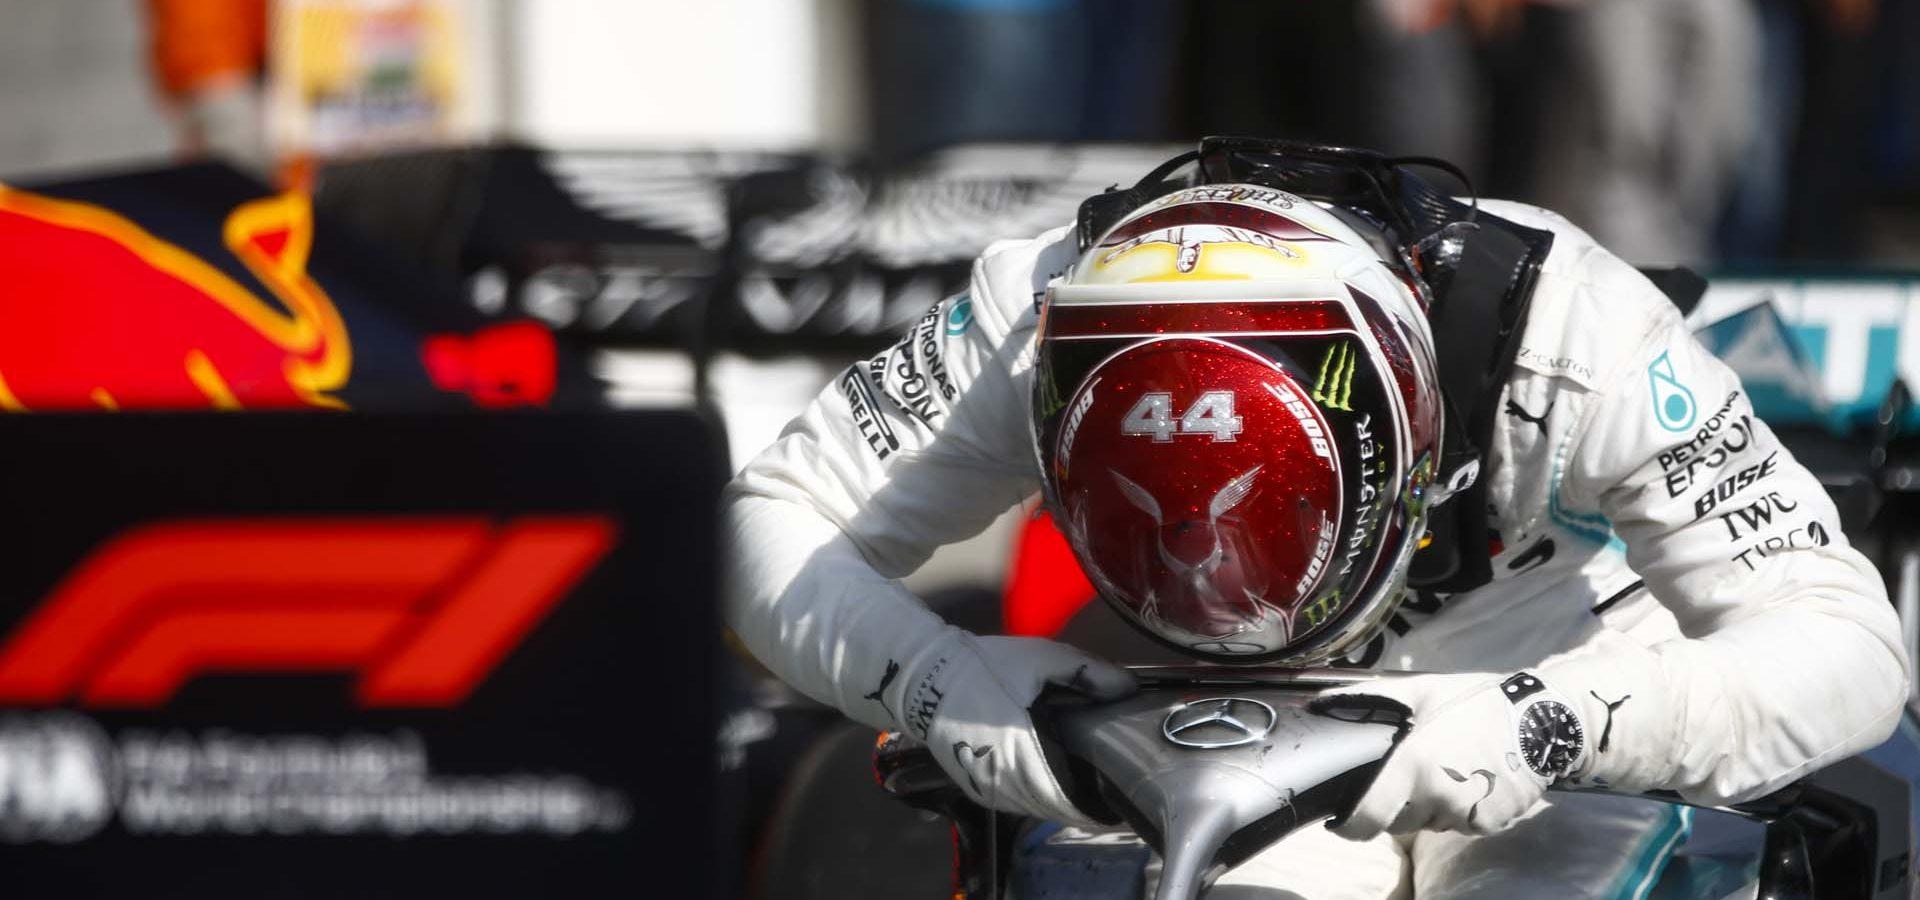 2019 Hungarian Grand Prix, Sunday - LAT Images Lewis Hamilton Mercedes